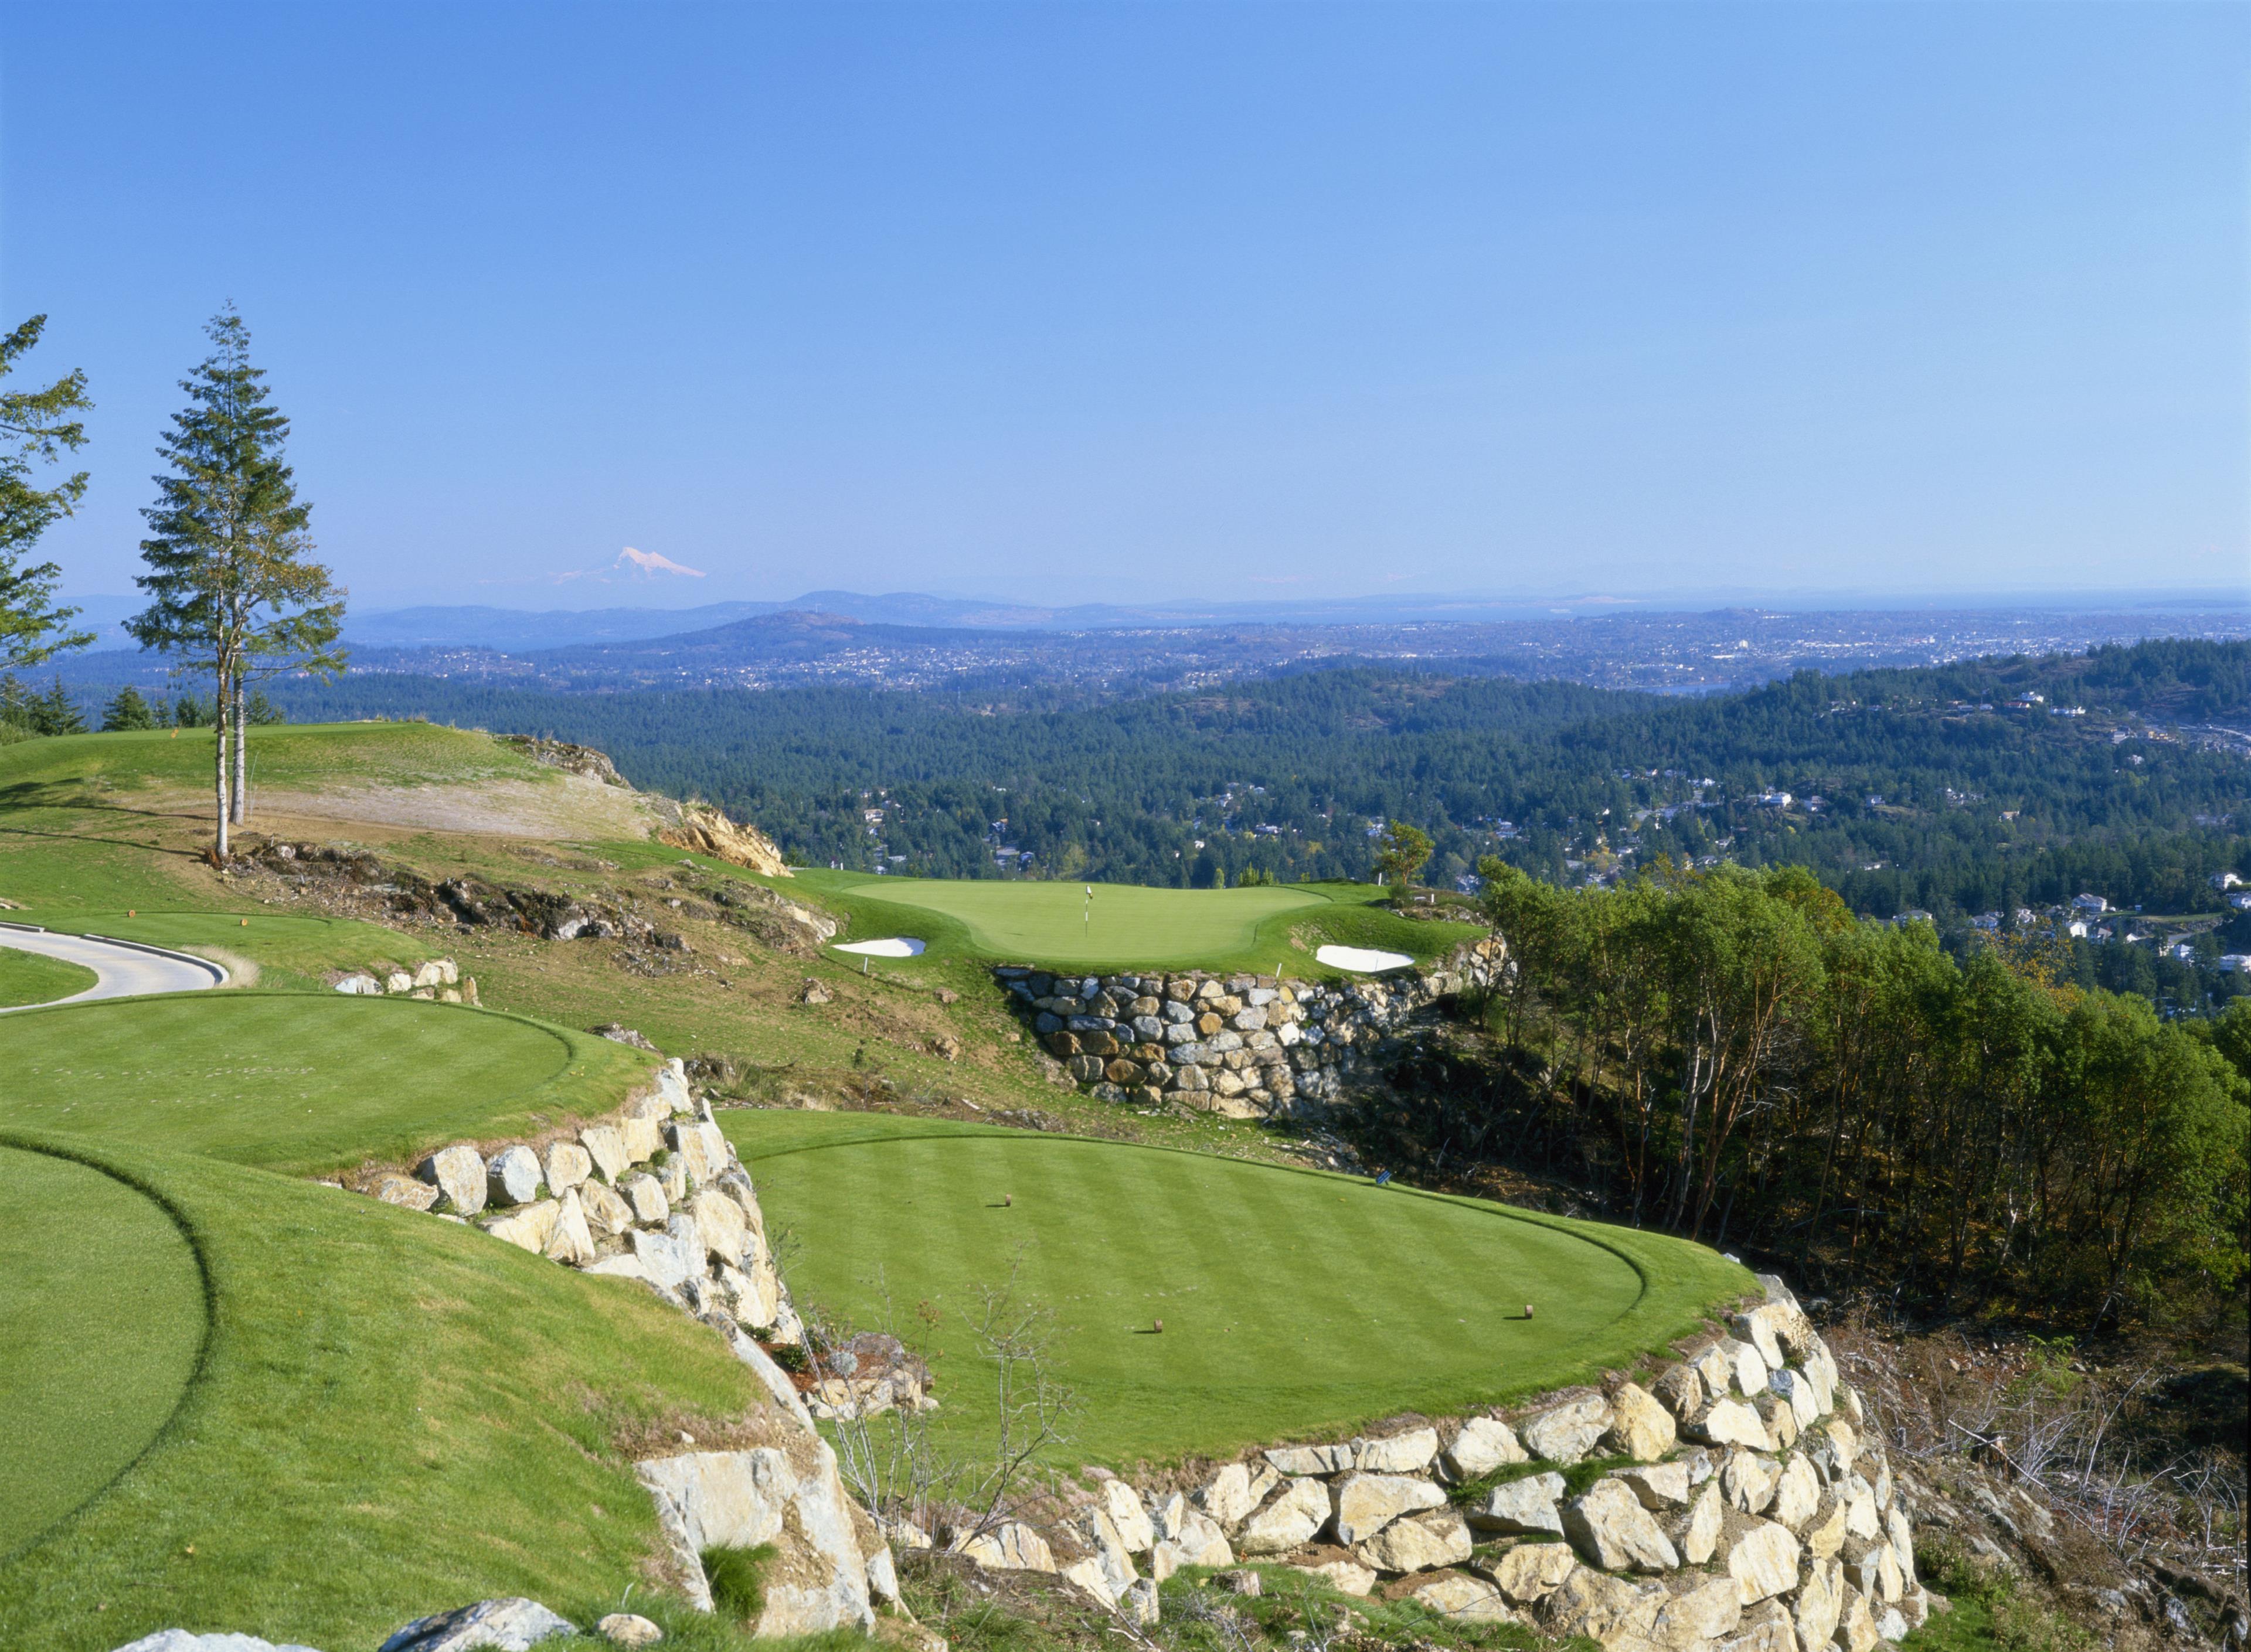 The Westin Bear Mountain Golf Resort & Spa, Victoria in Victoria: Mountain Hole #19 Betting Hole